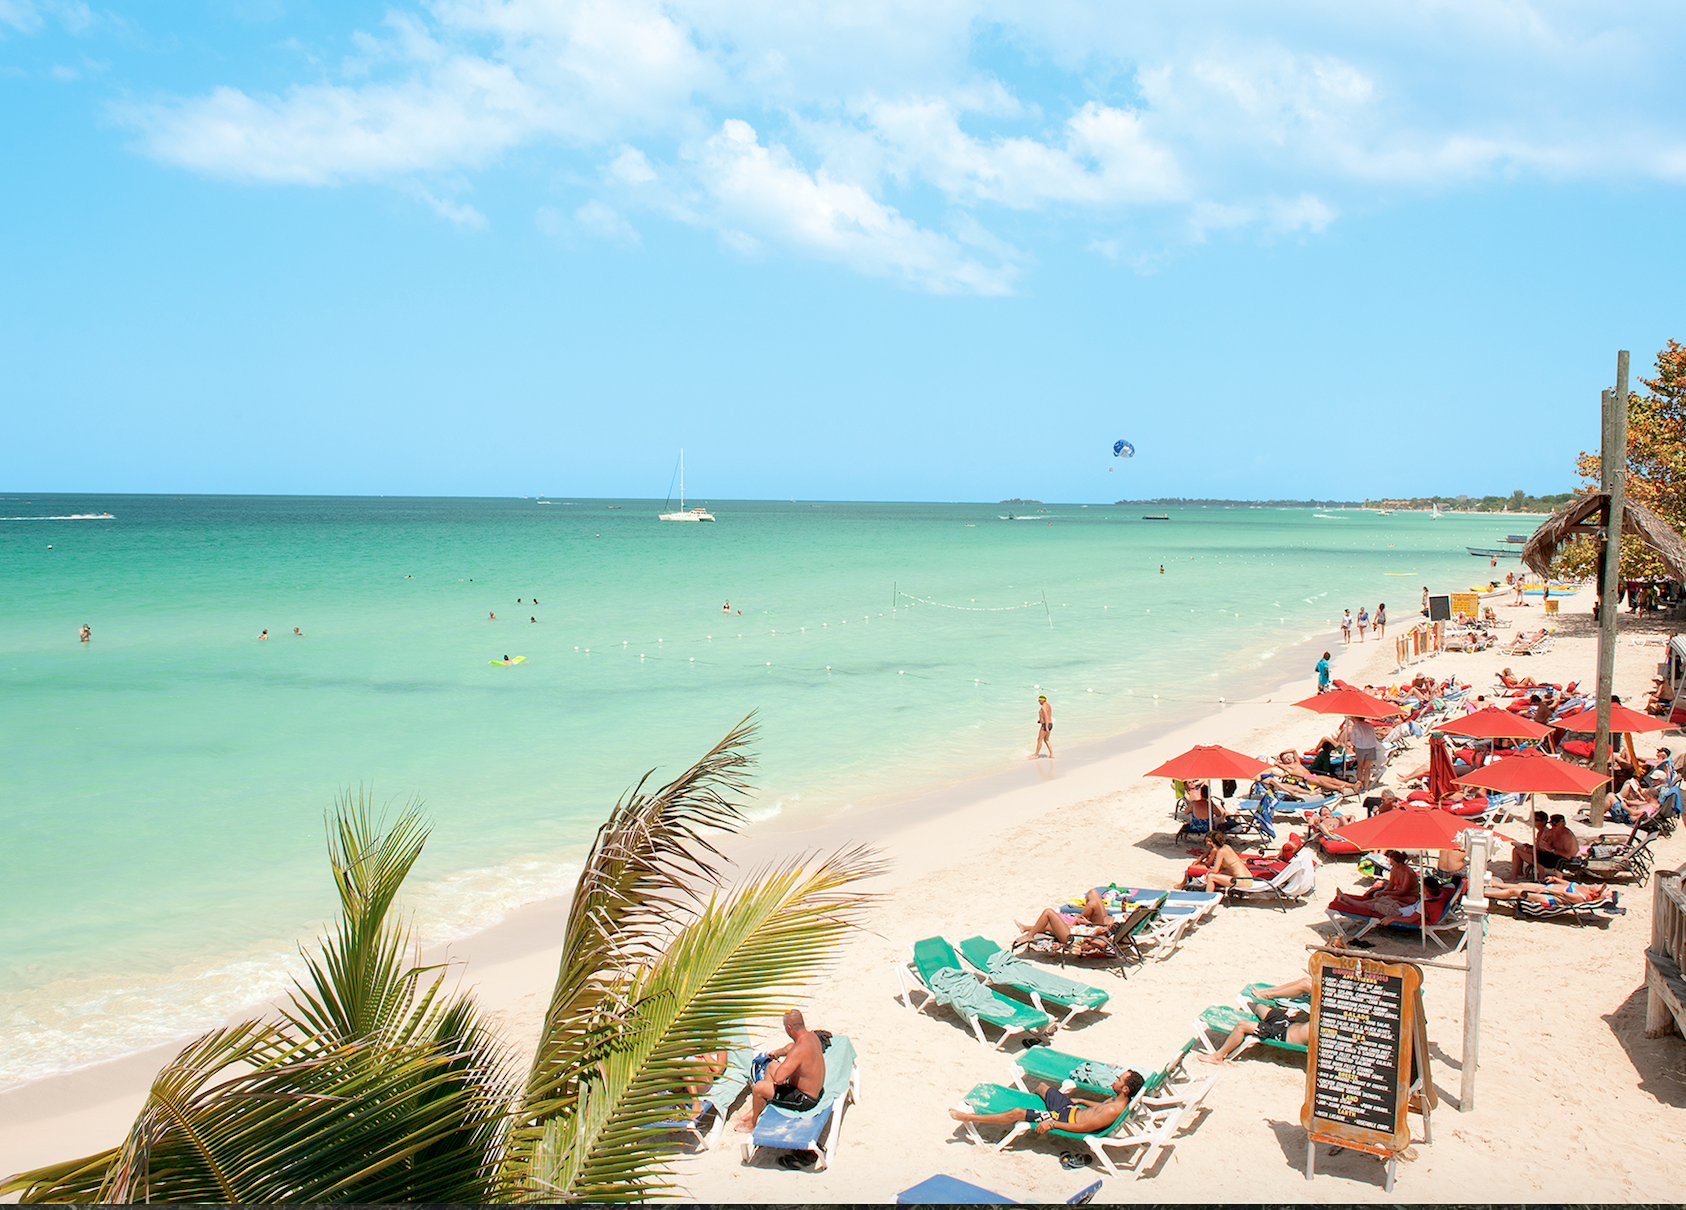 Seven Miles Beachi i Negril. helt vest på Jamaica. Foto: Ving.